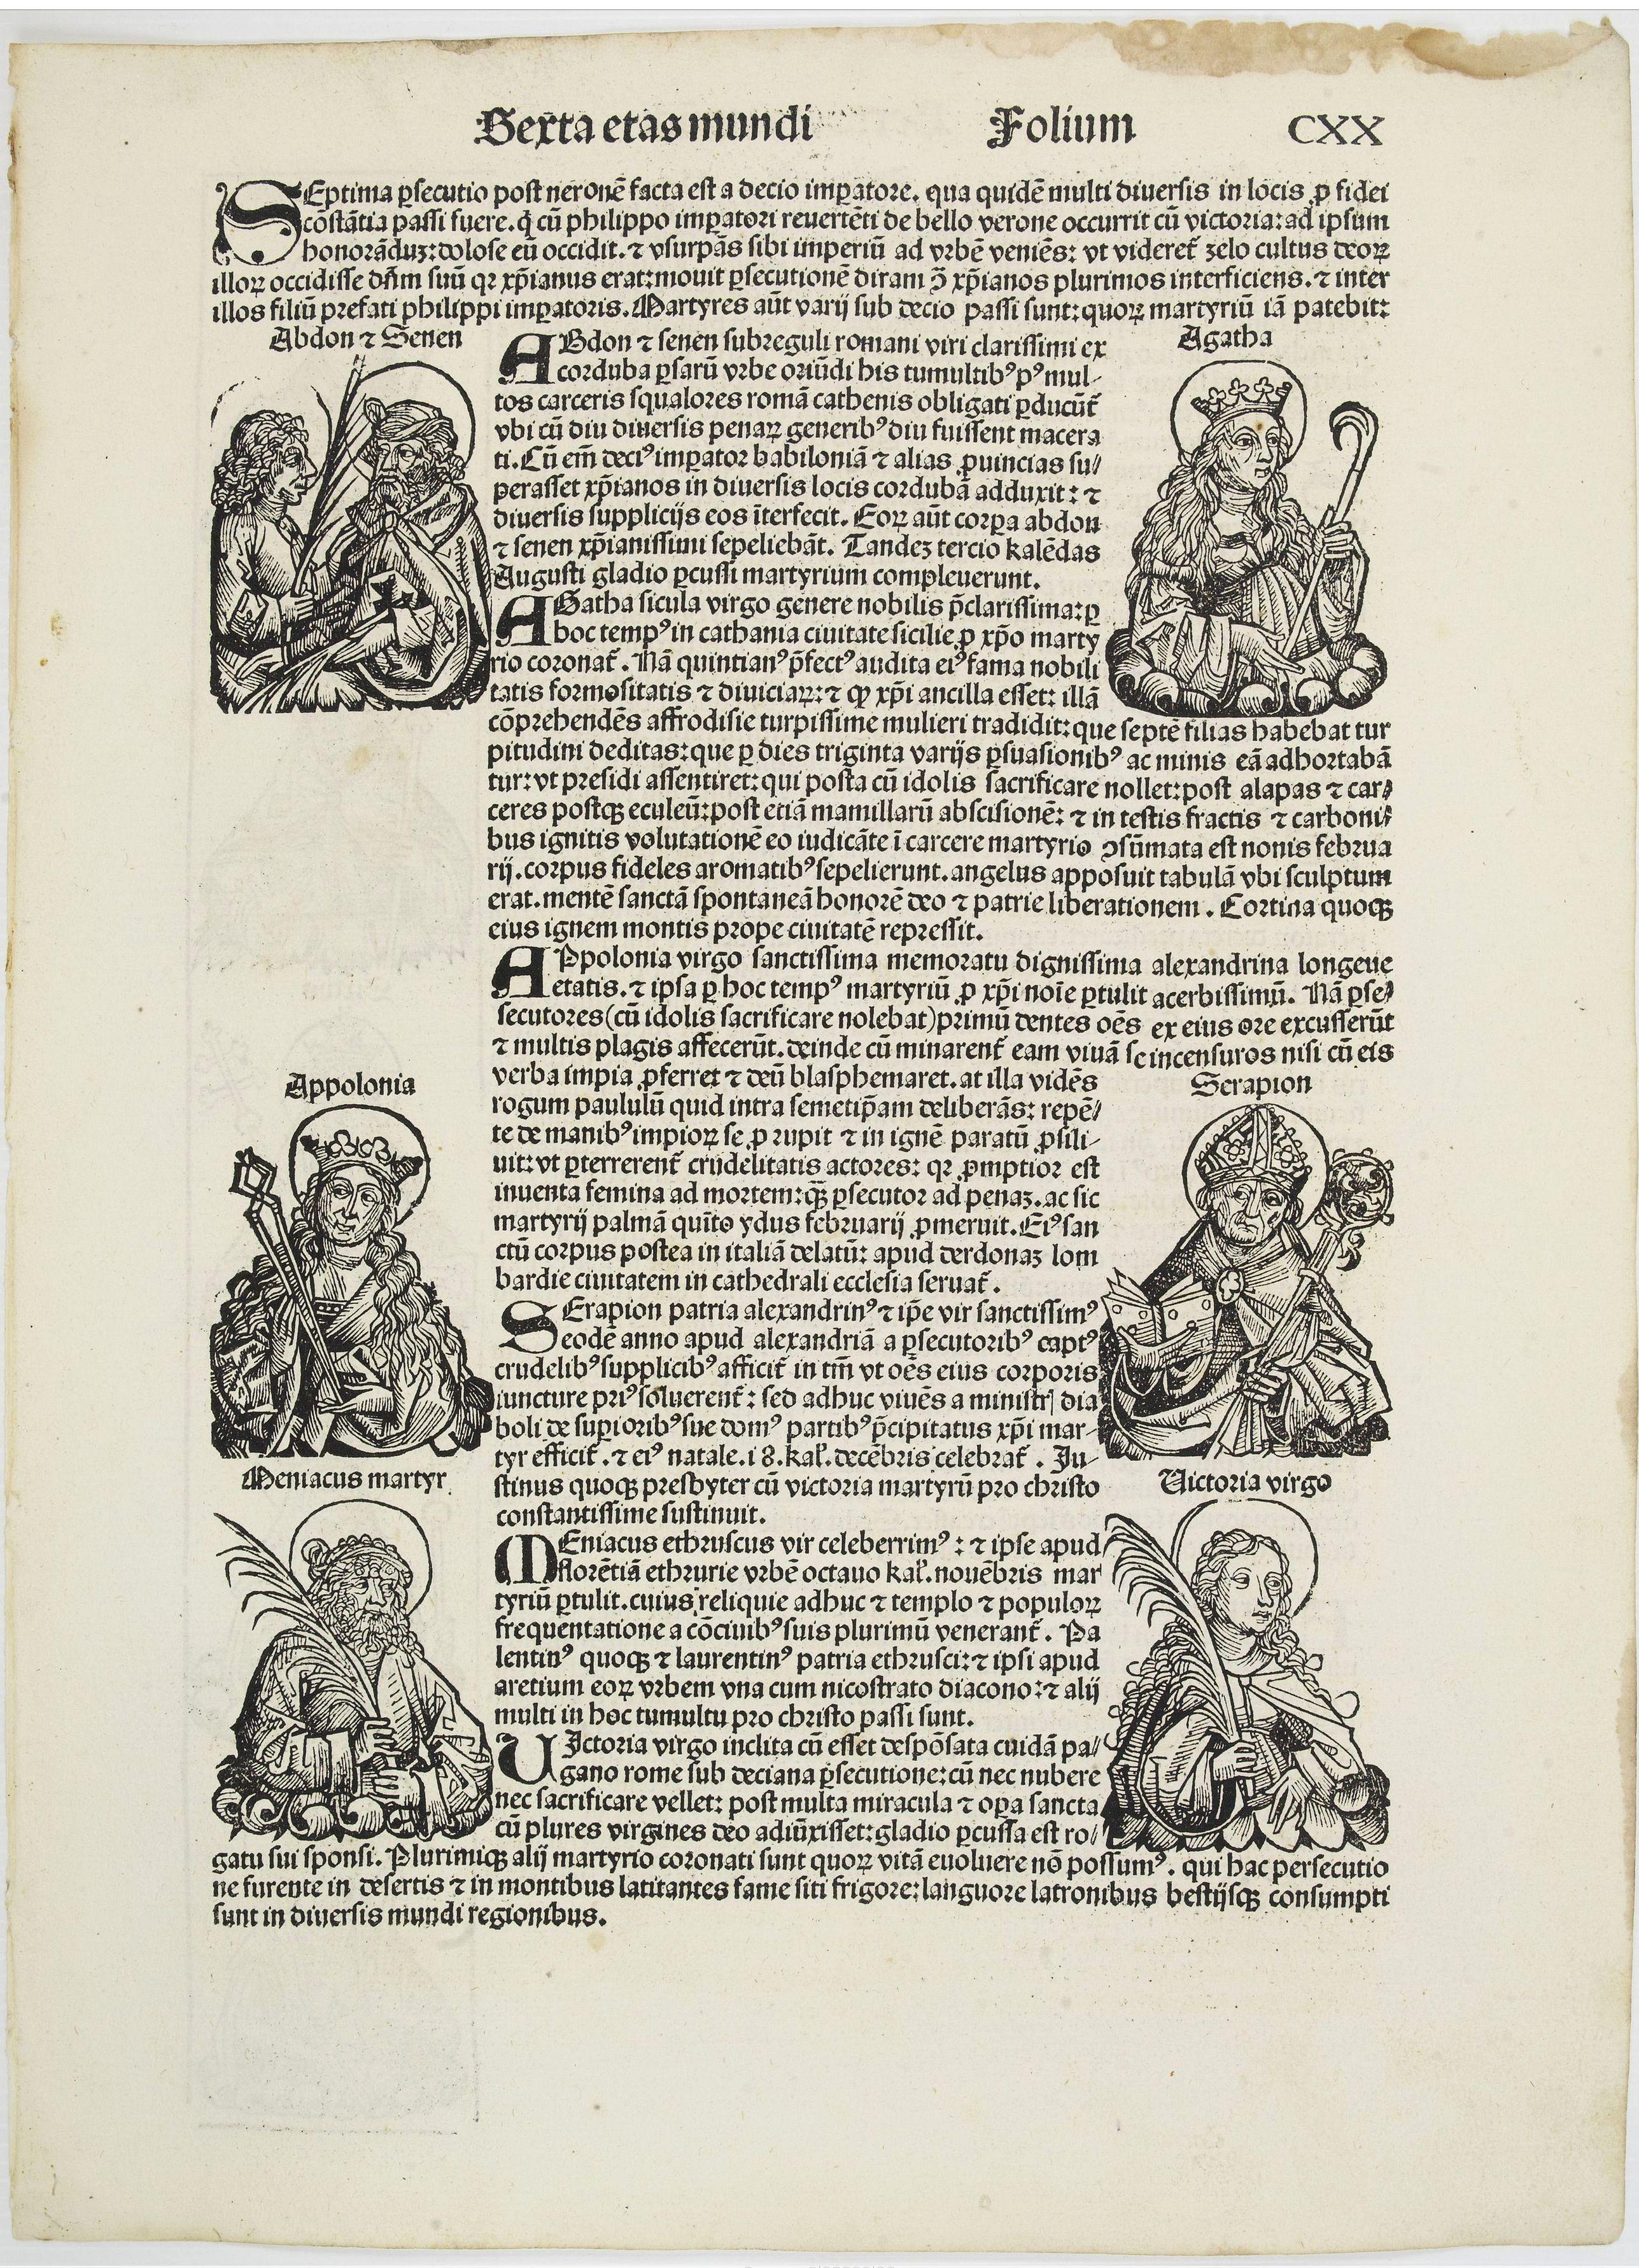 SCHEDEL, H. -  [Text page with Saint Appolonia, the patron saint of dentistry.]  - Sexta Etas Mundi. Folium. CXX .